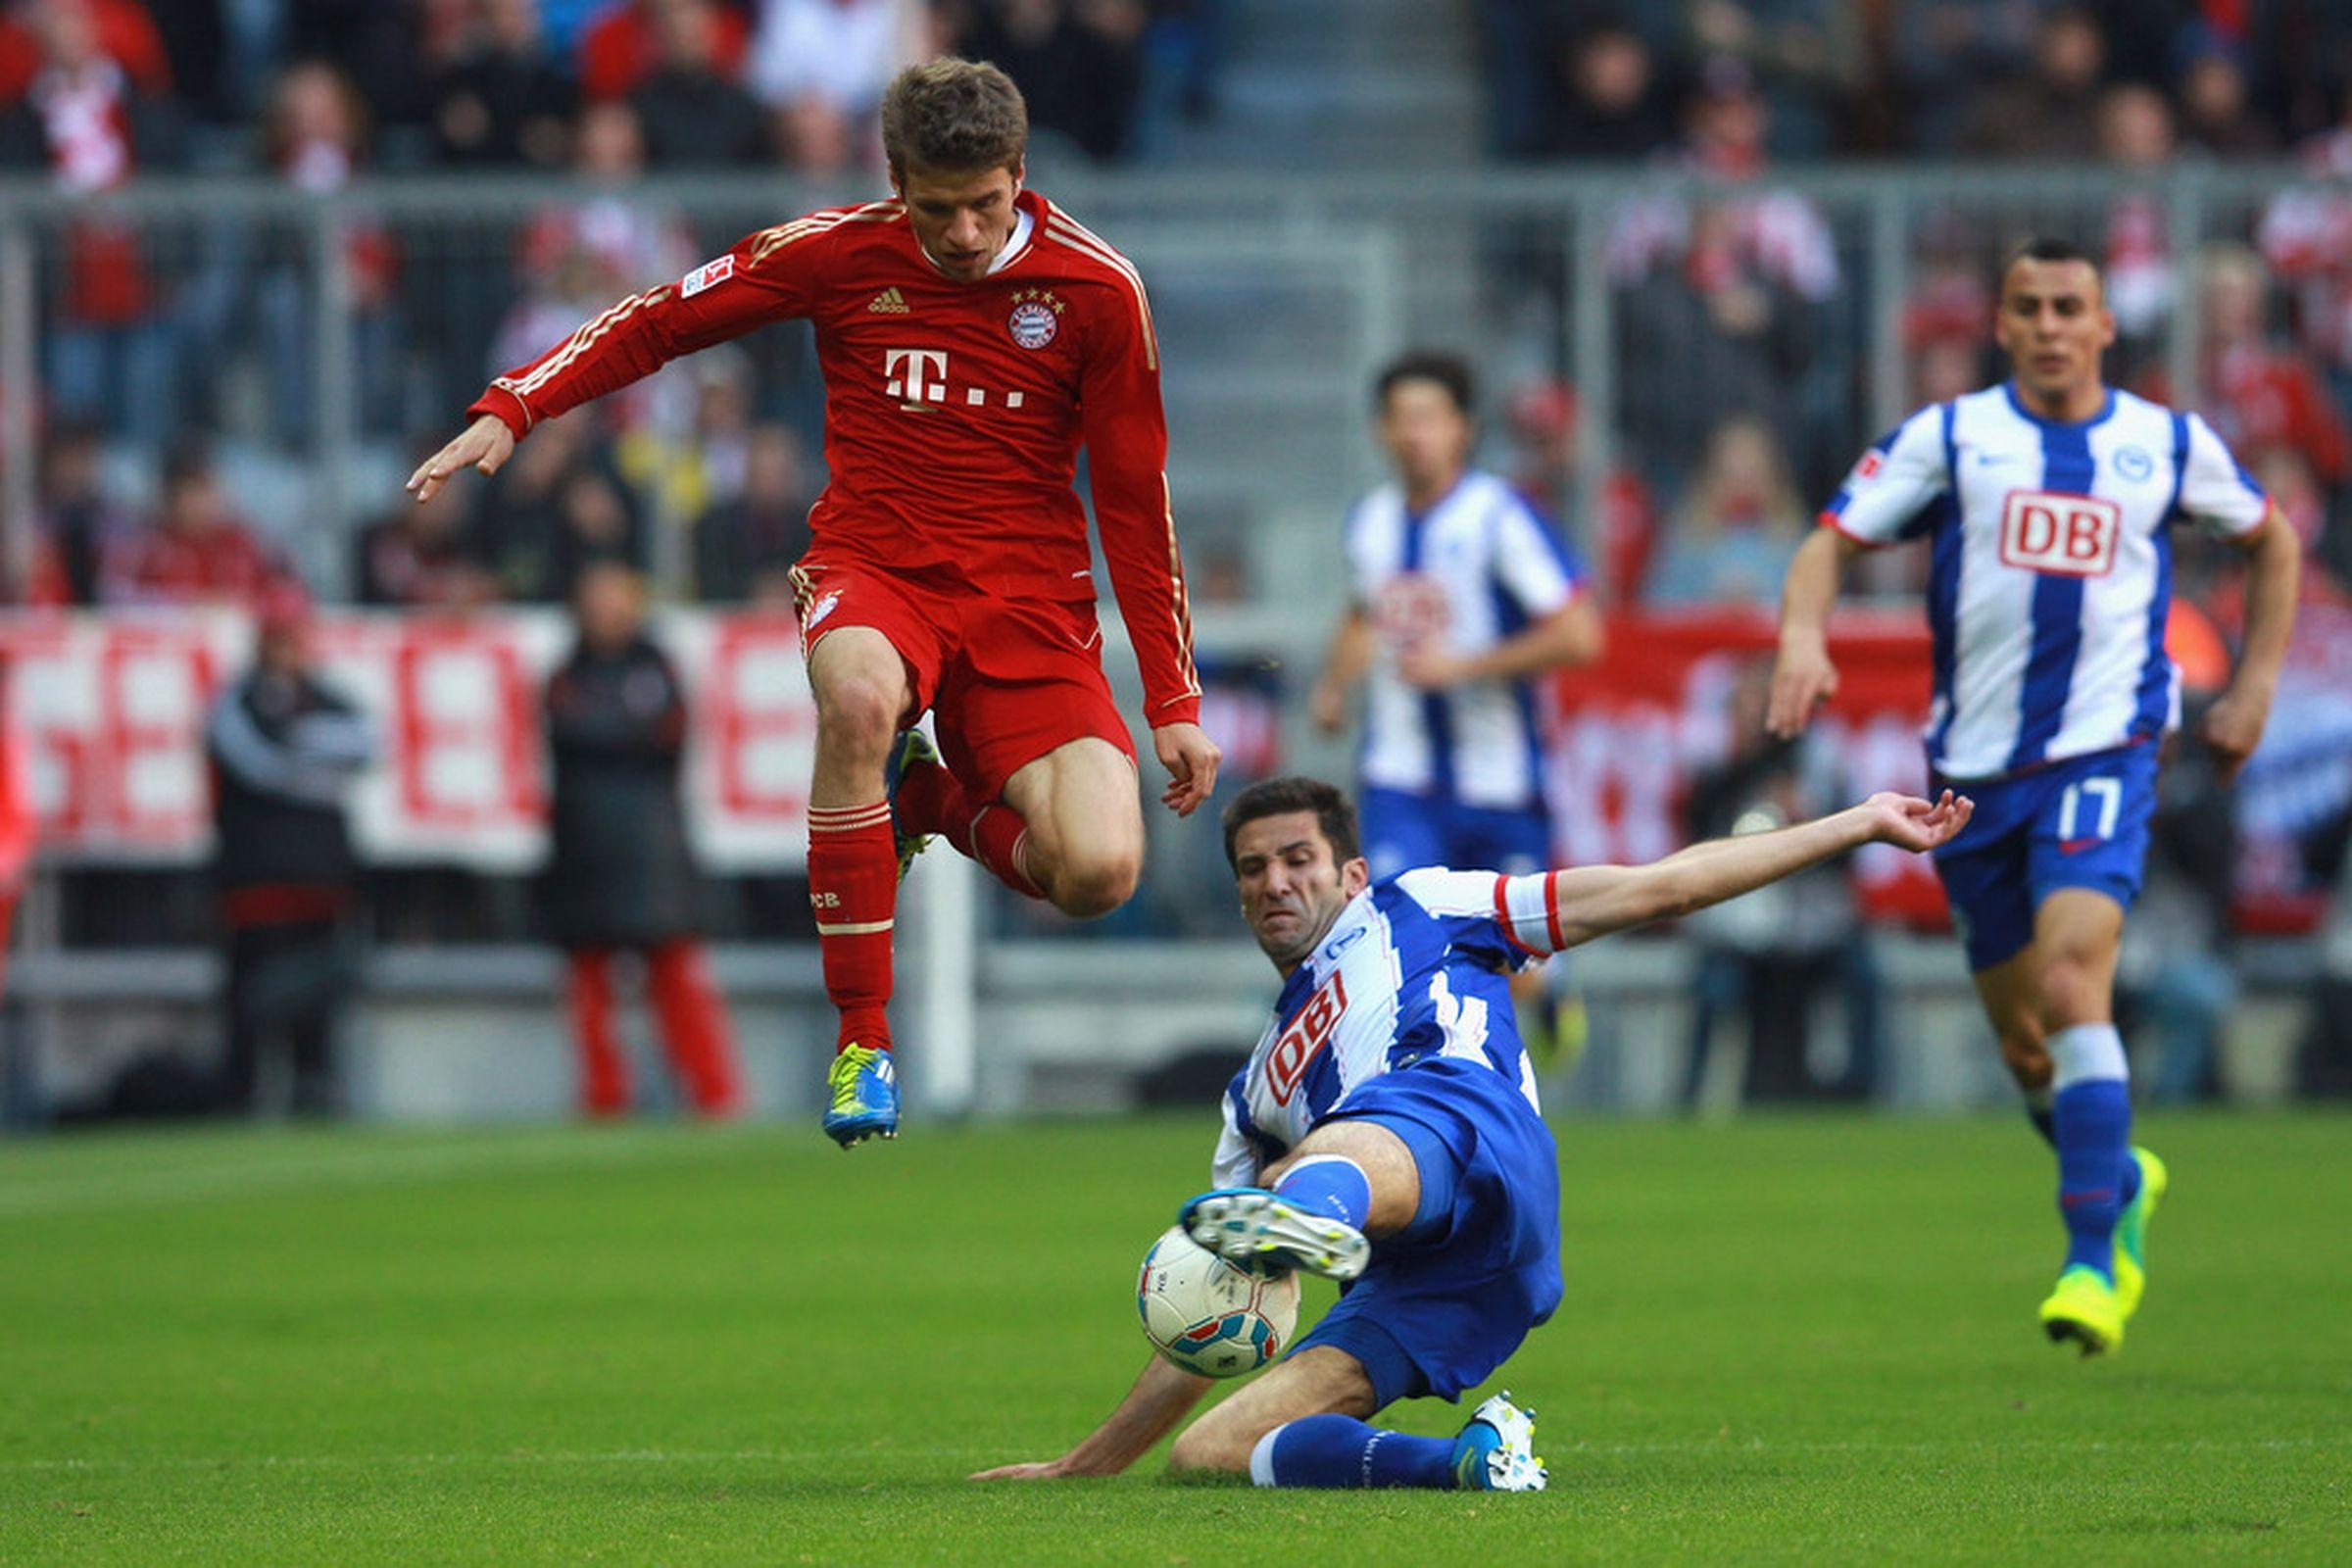 Ponturi Pariuri Hertha vs Bayern Munchen – Bundesliga